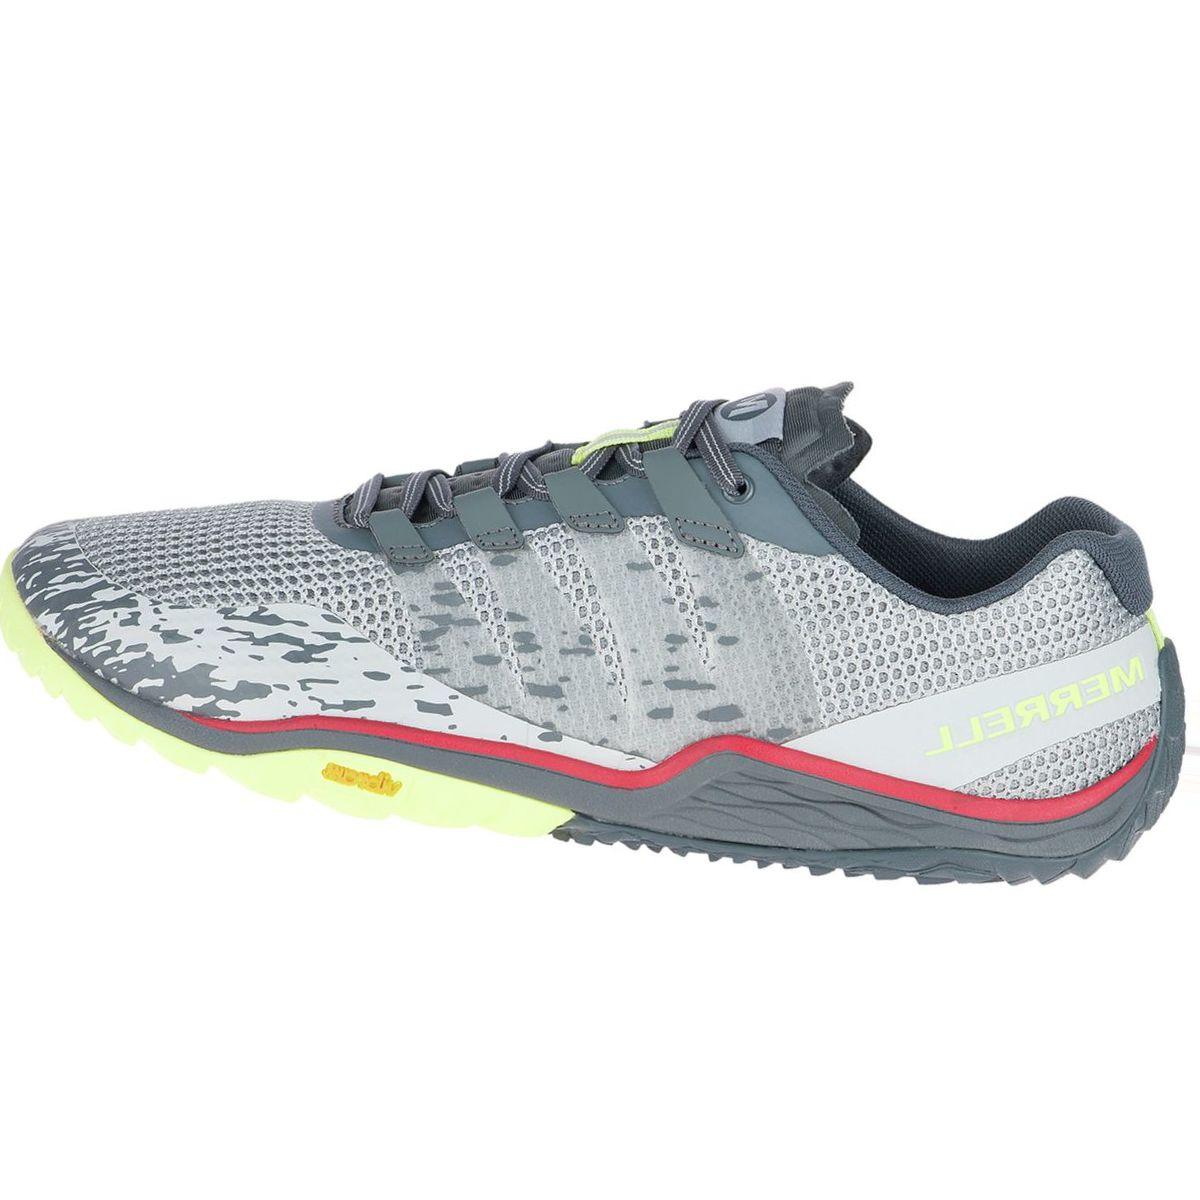 Merrell Trail Glove 5 Shoe - Men's